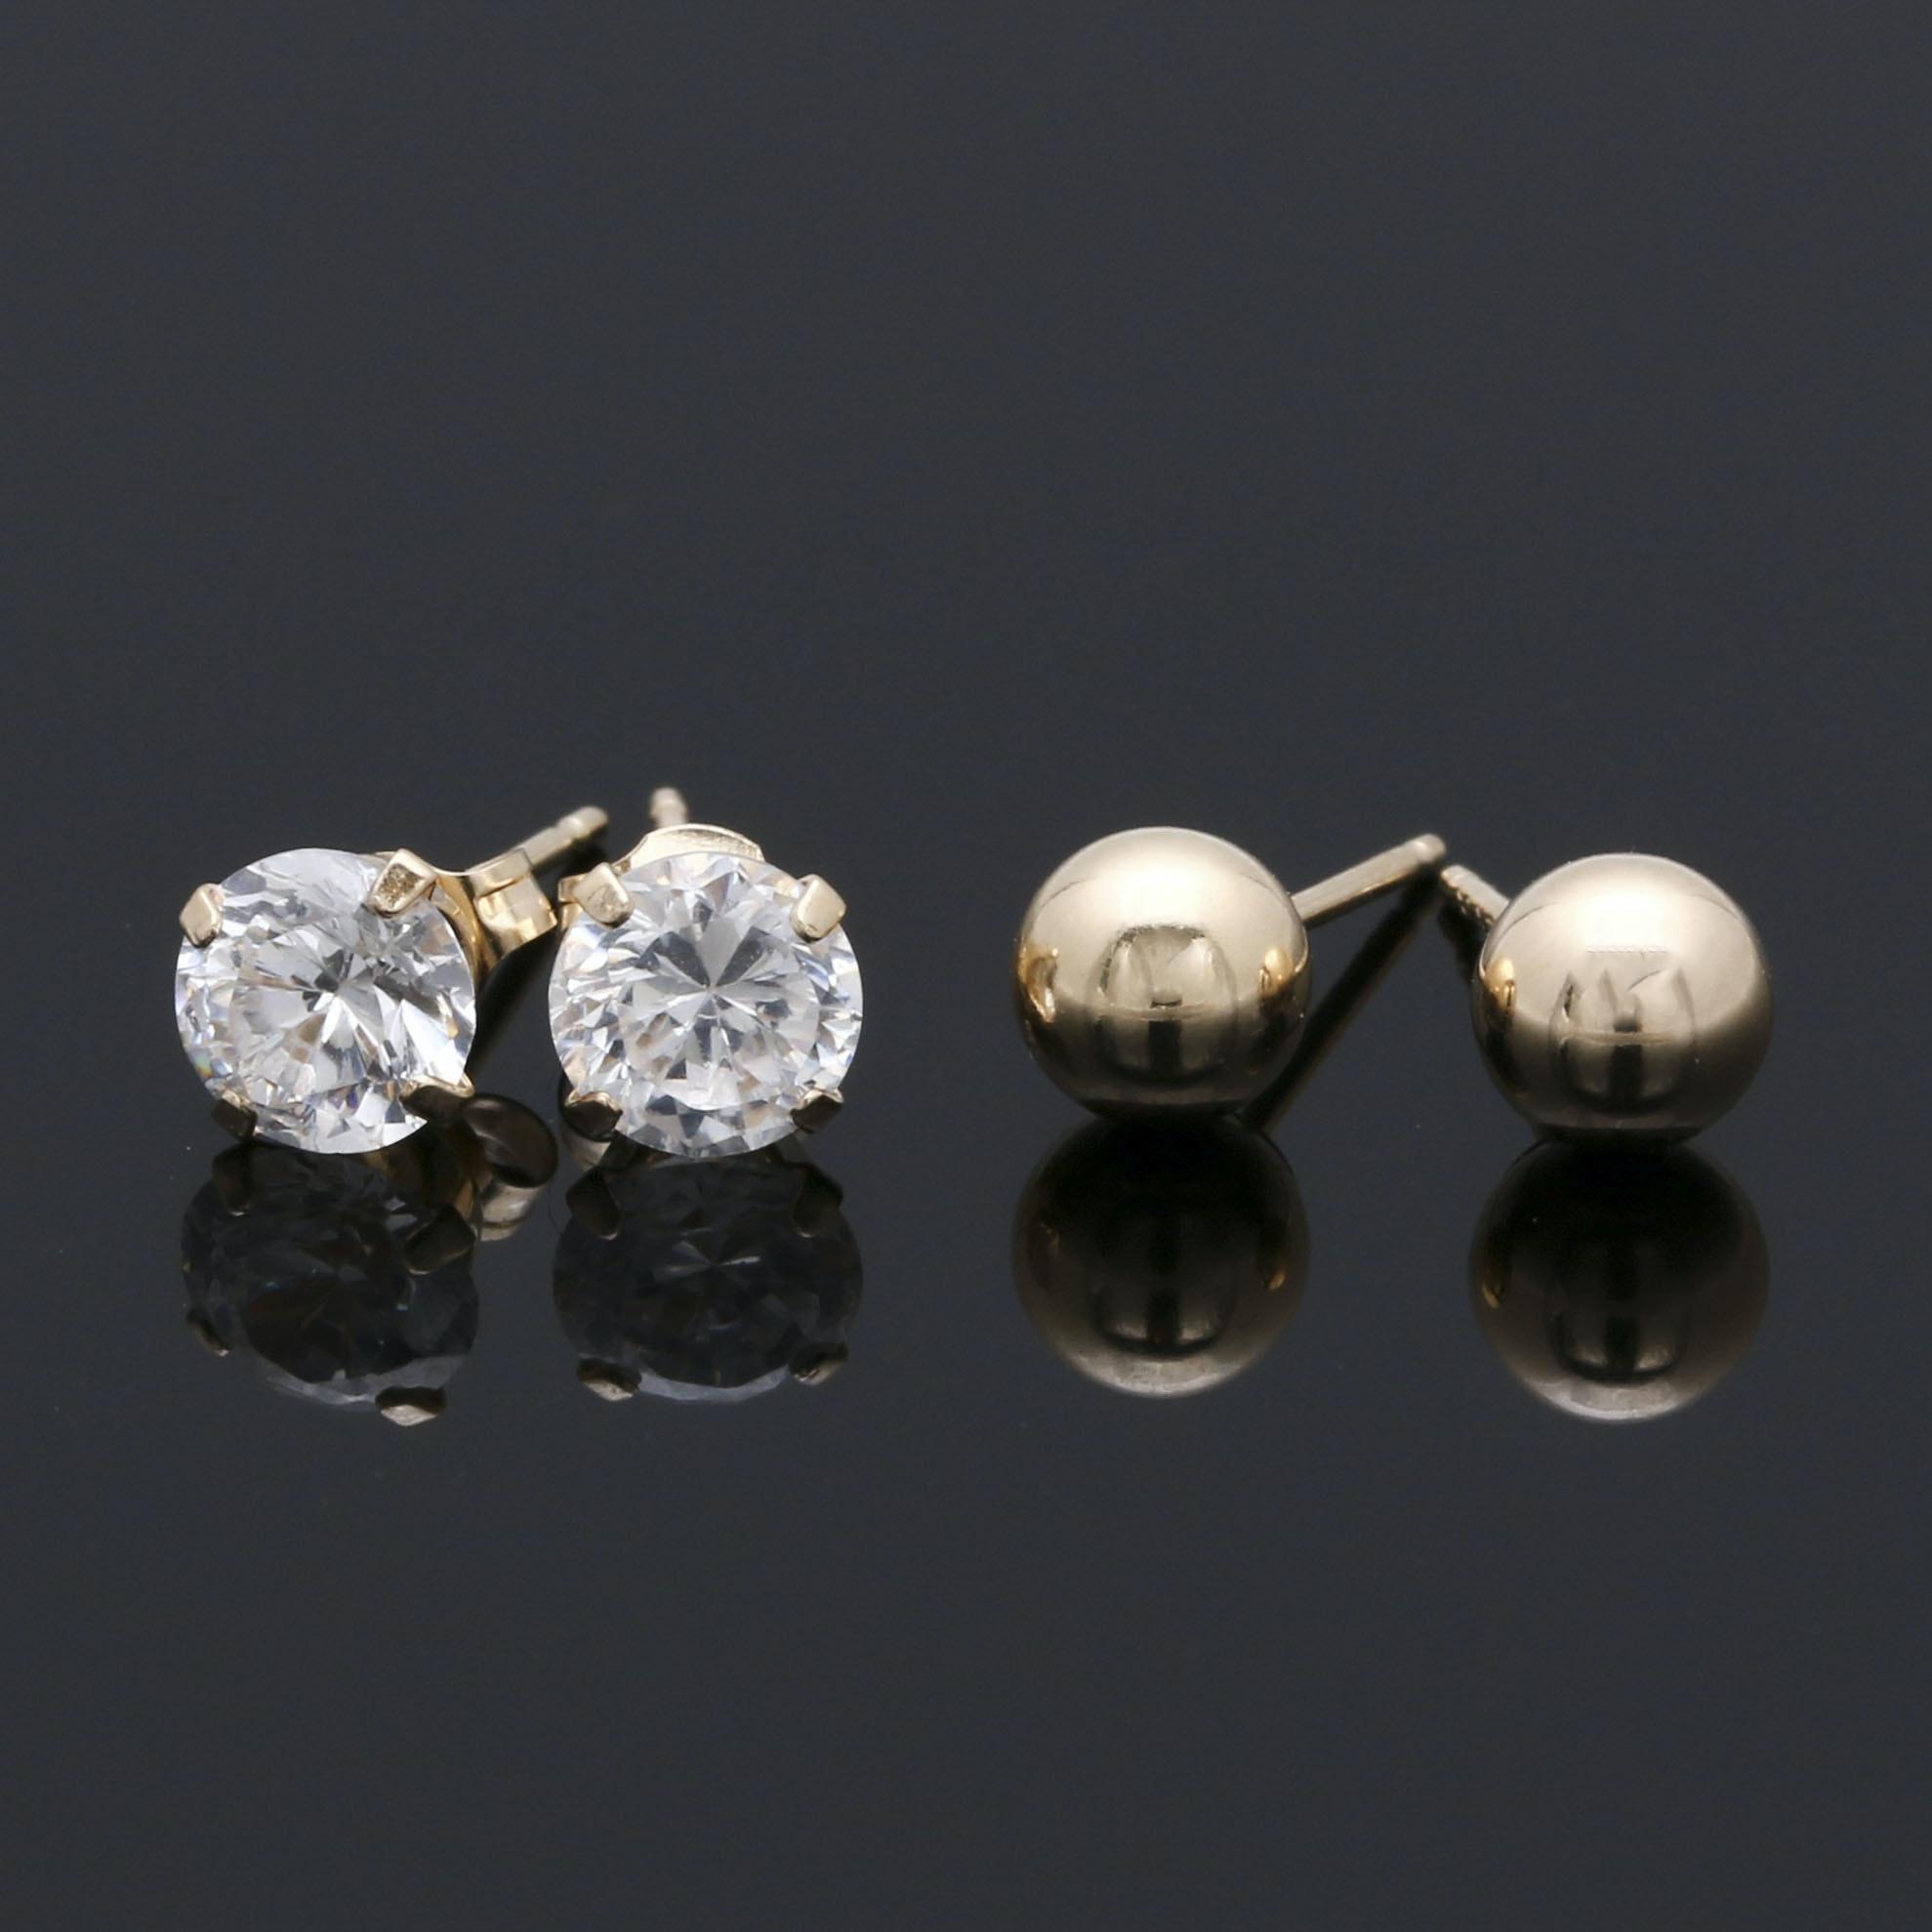 14K Yellow Gold Cubic Zirconia Earrings Selection